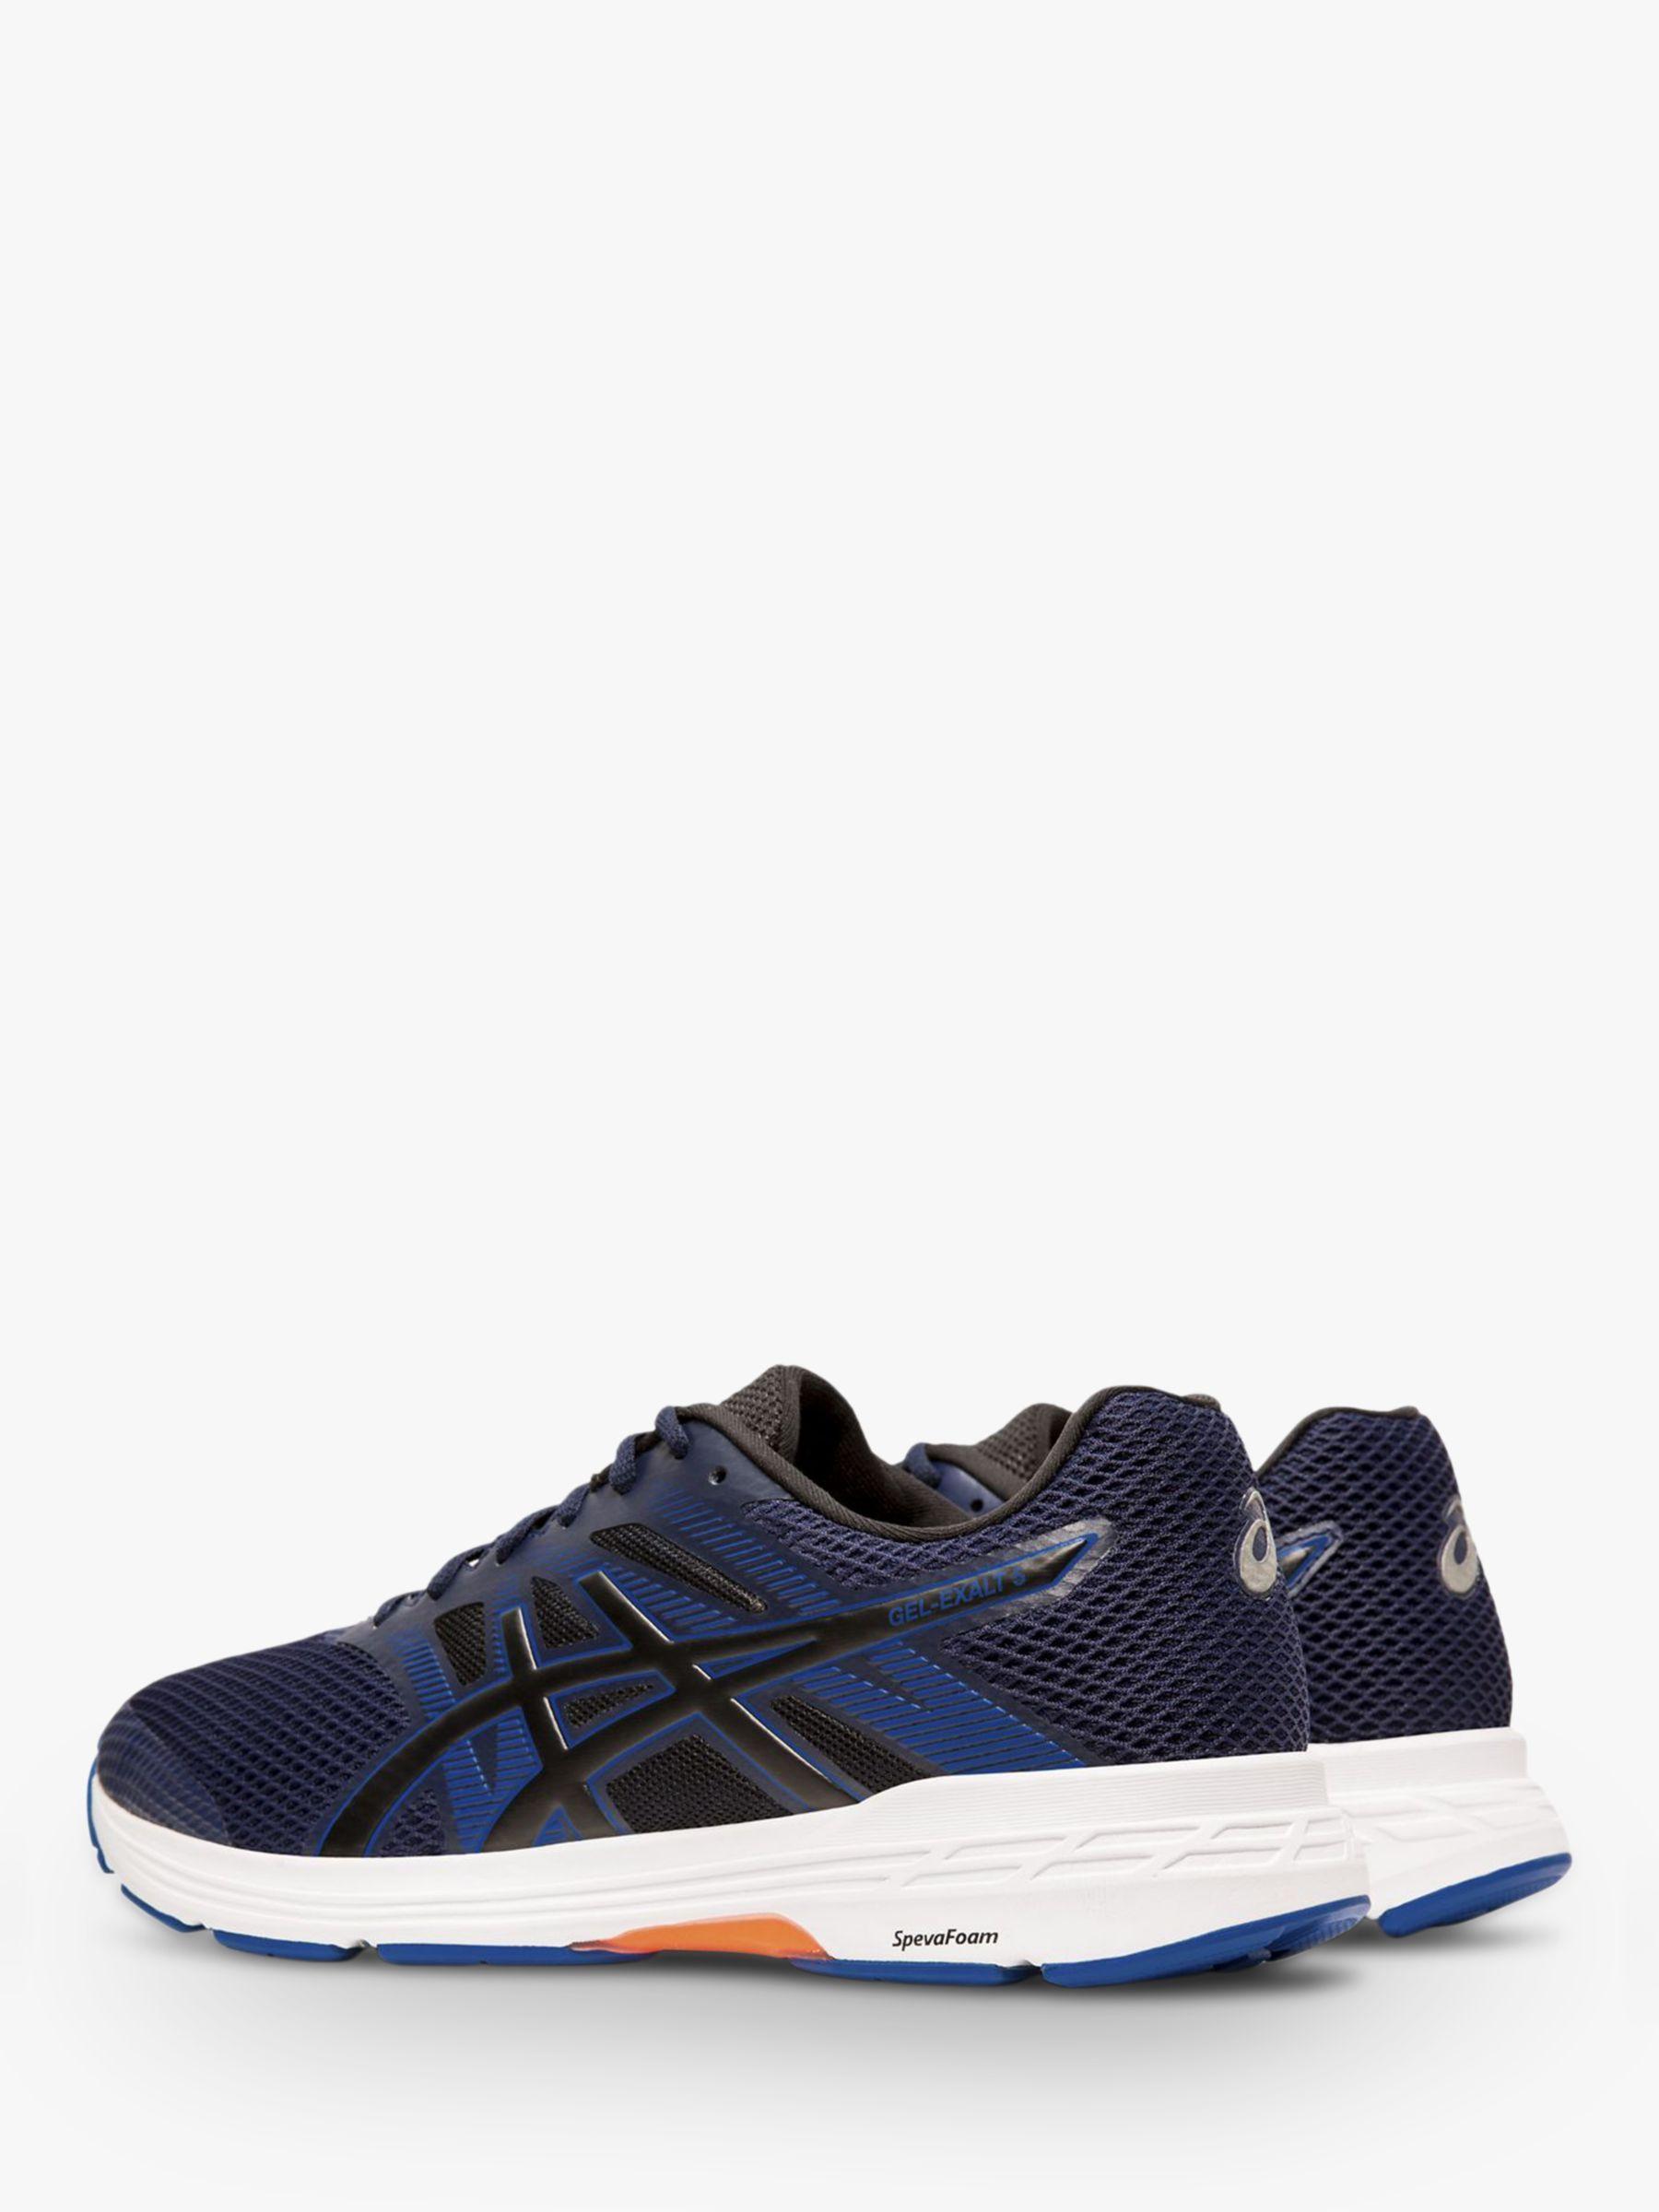 ASICS GEL EXALT 5 Men's Running Shoes in 2019 | Running